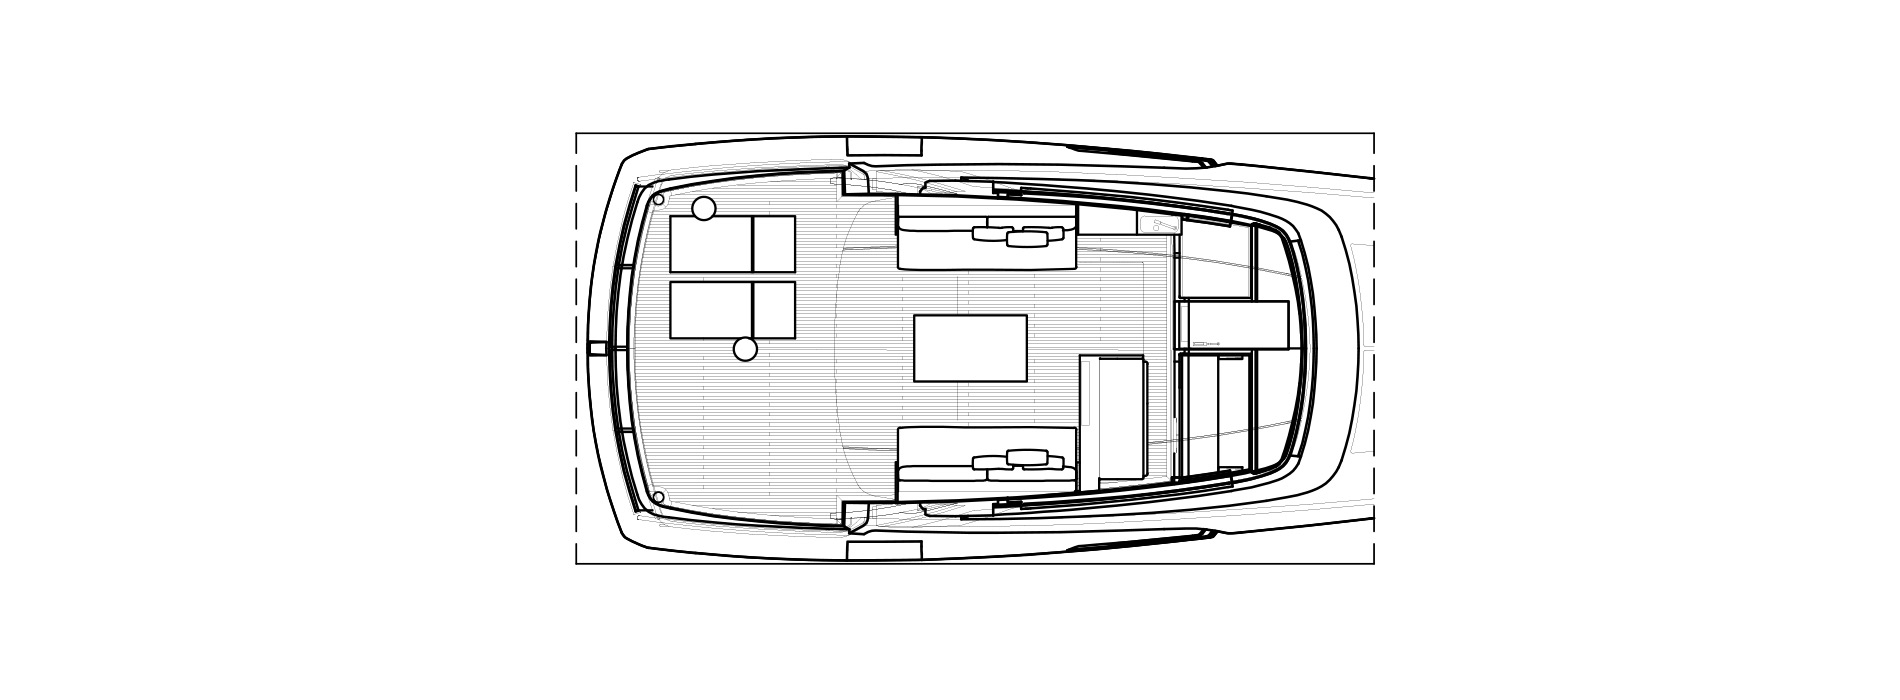 Sanlorenzo Yachts SX88 Details Version Lissoni